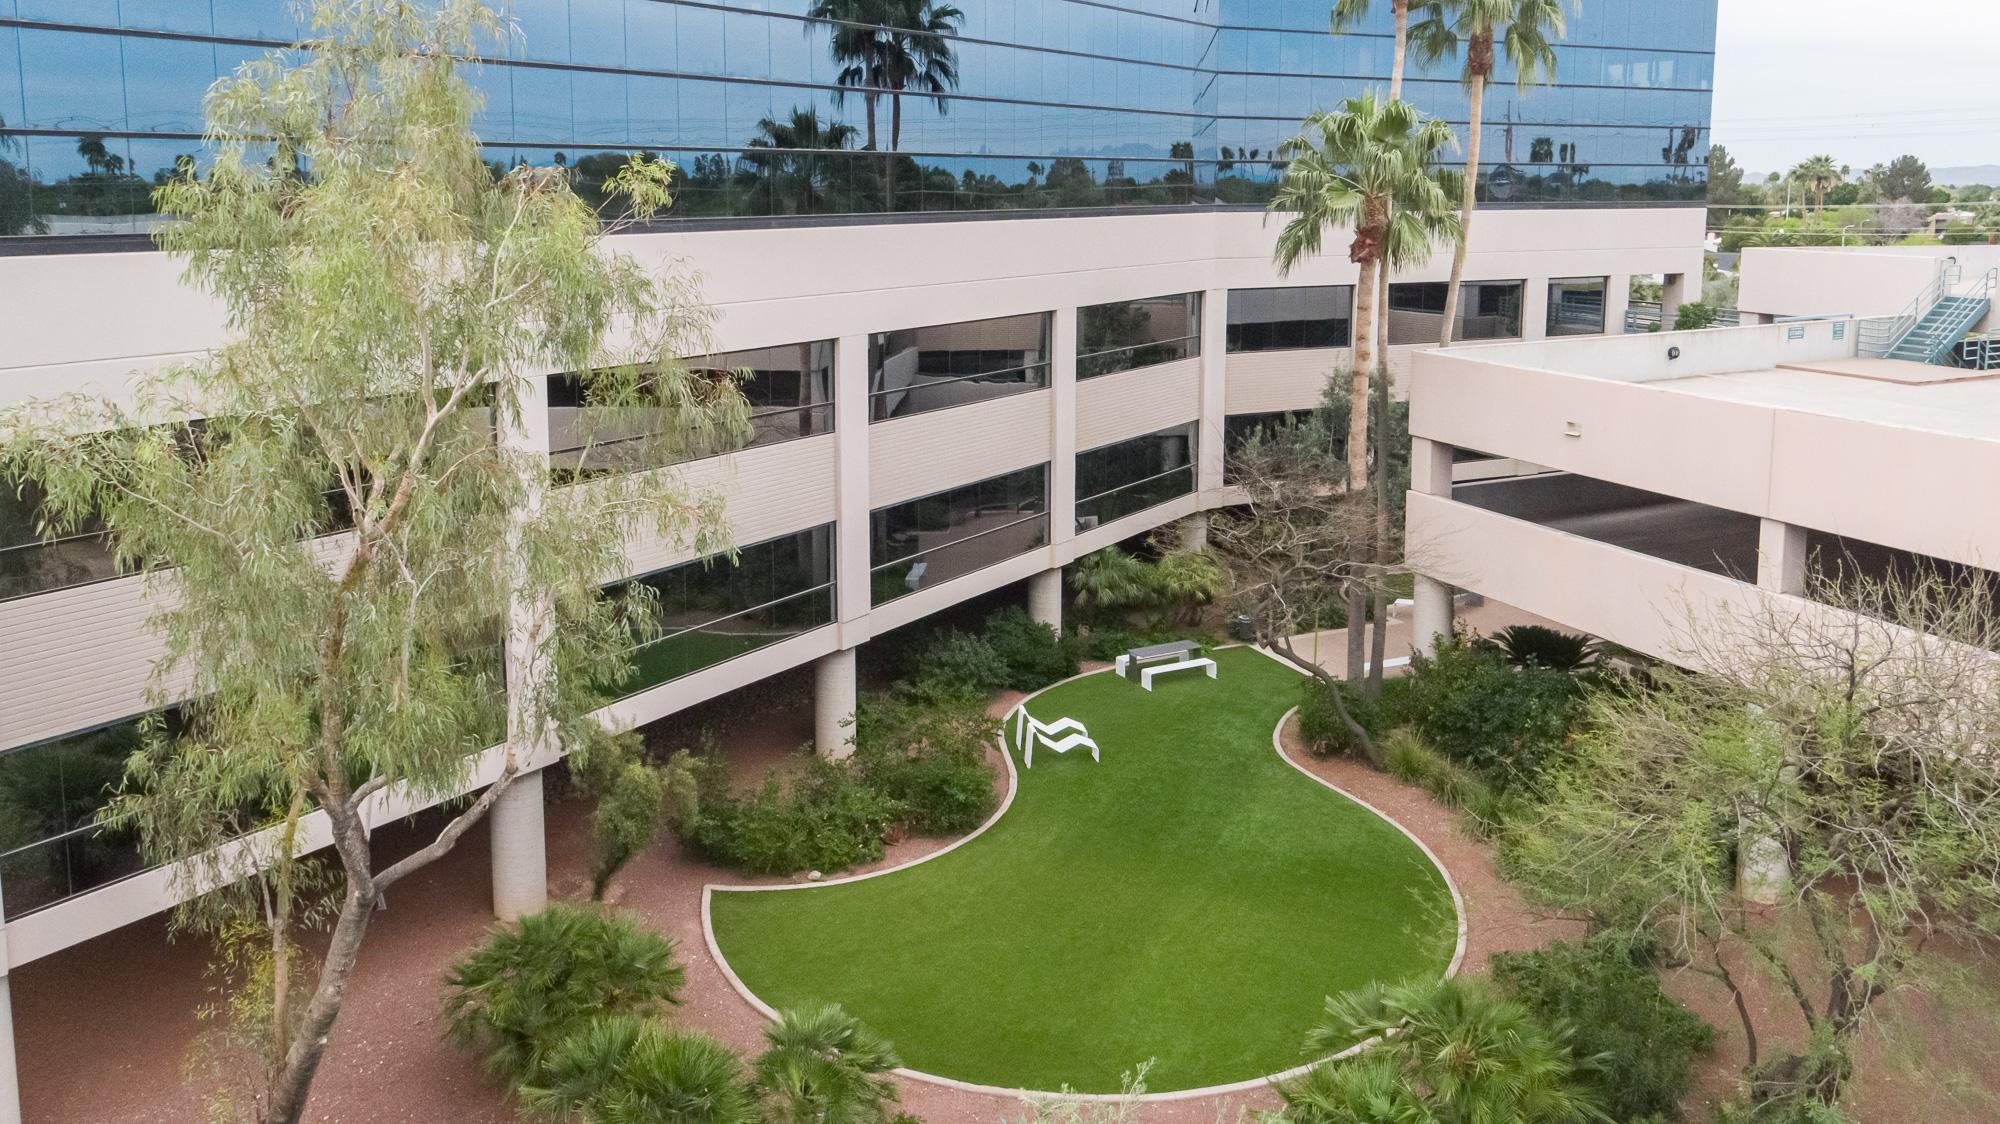 5080 N. 40th Street – Phoenix